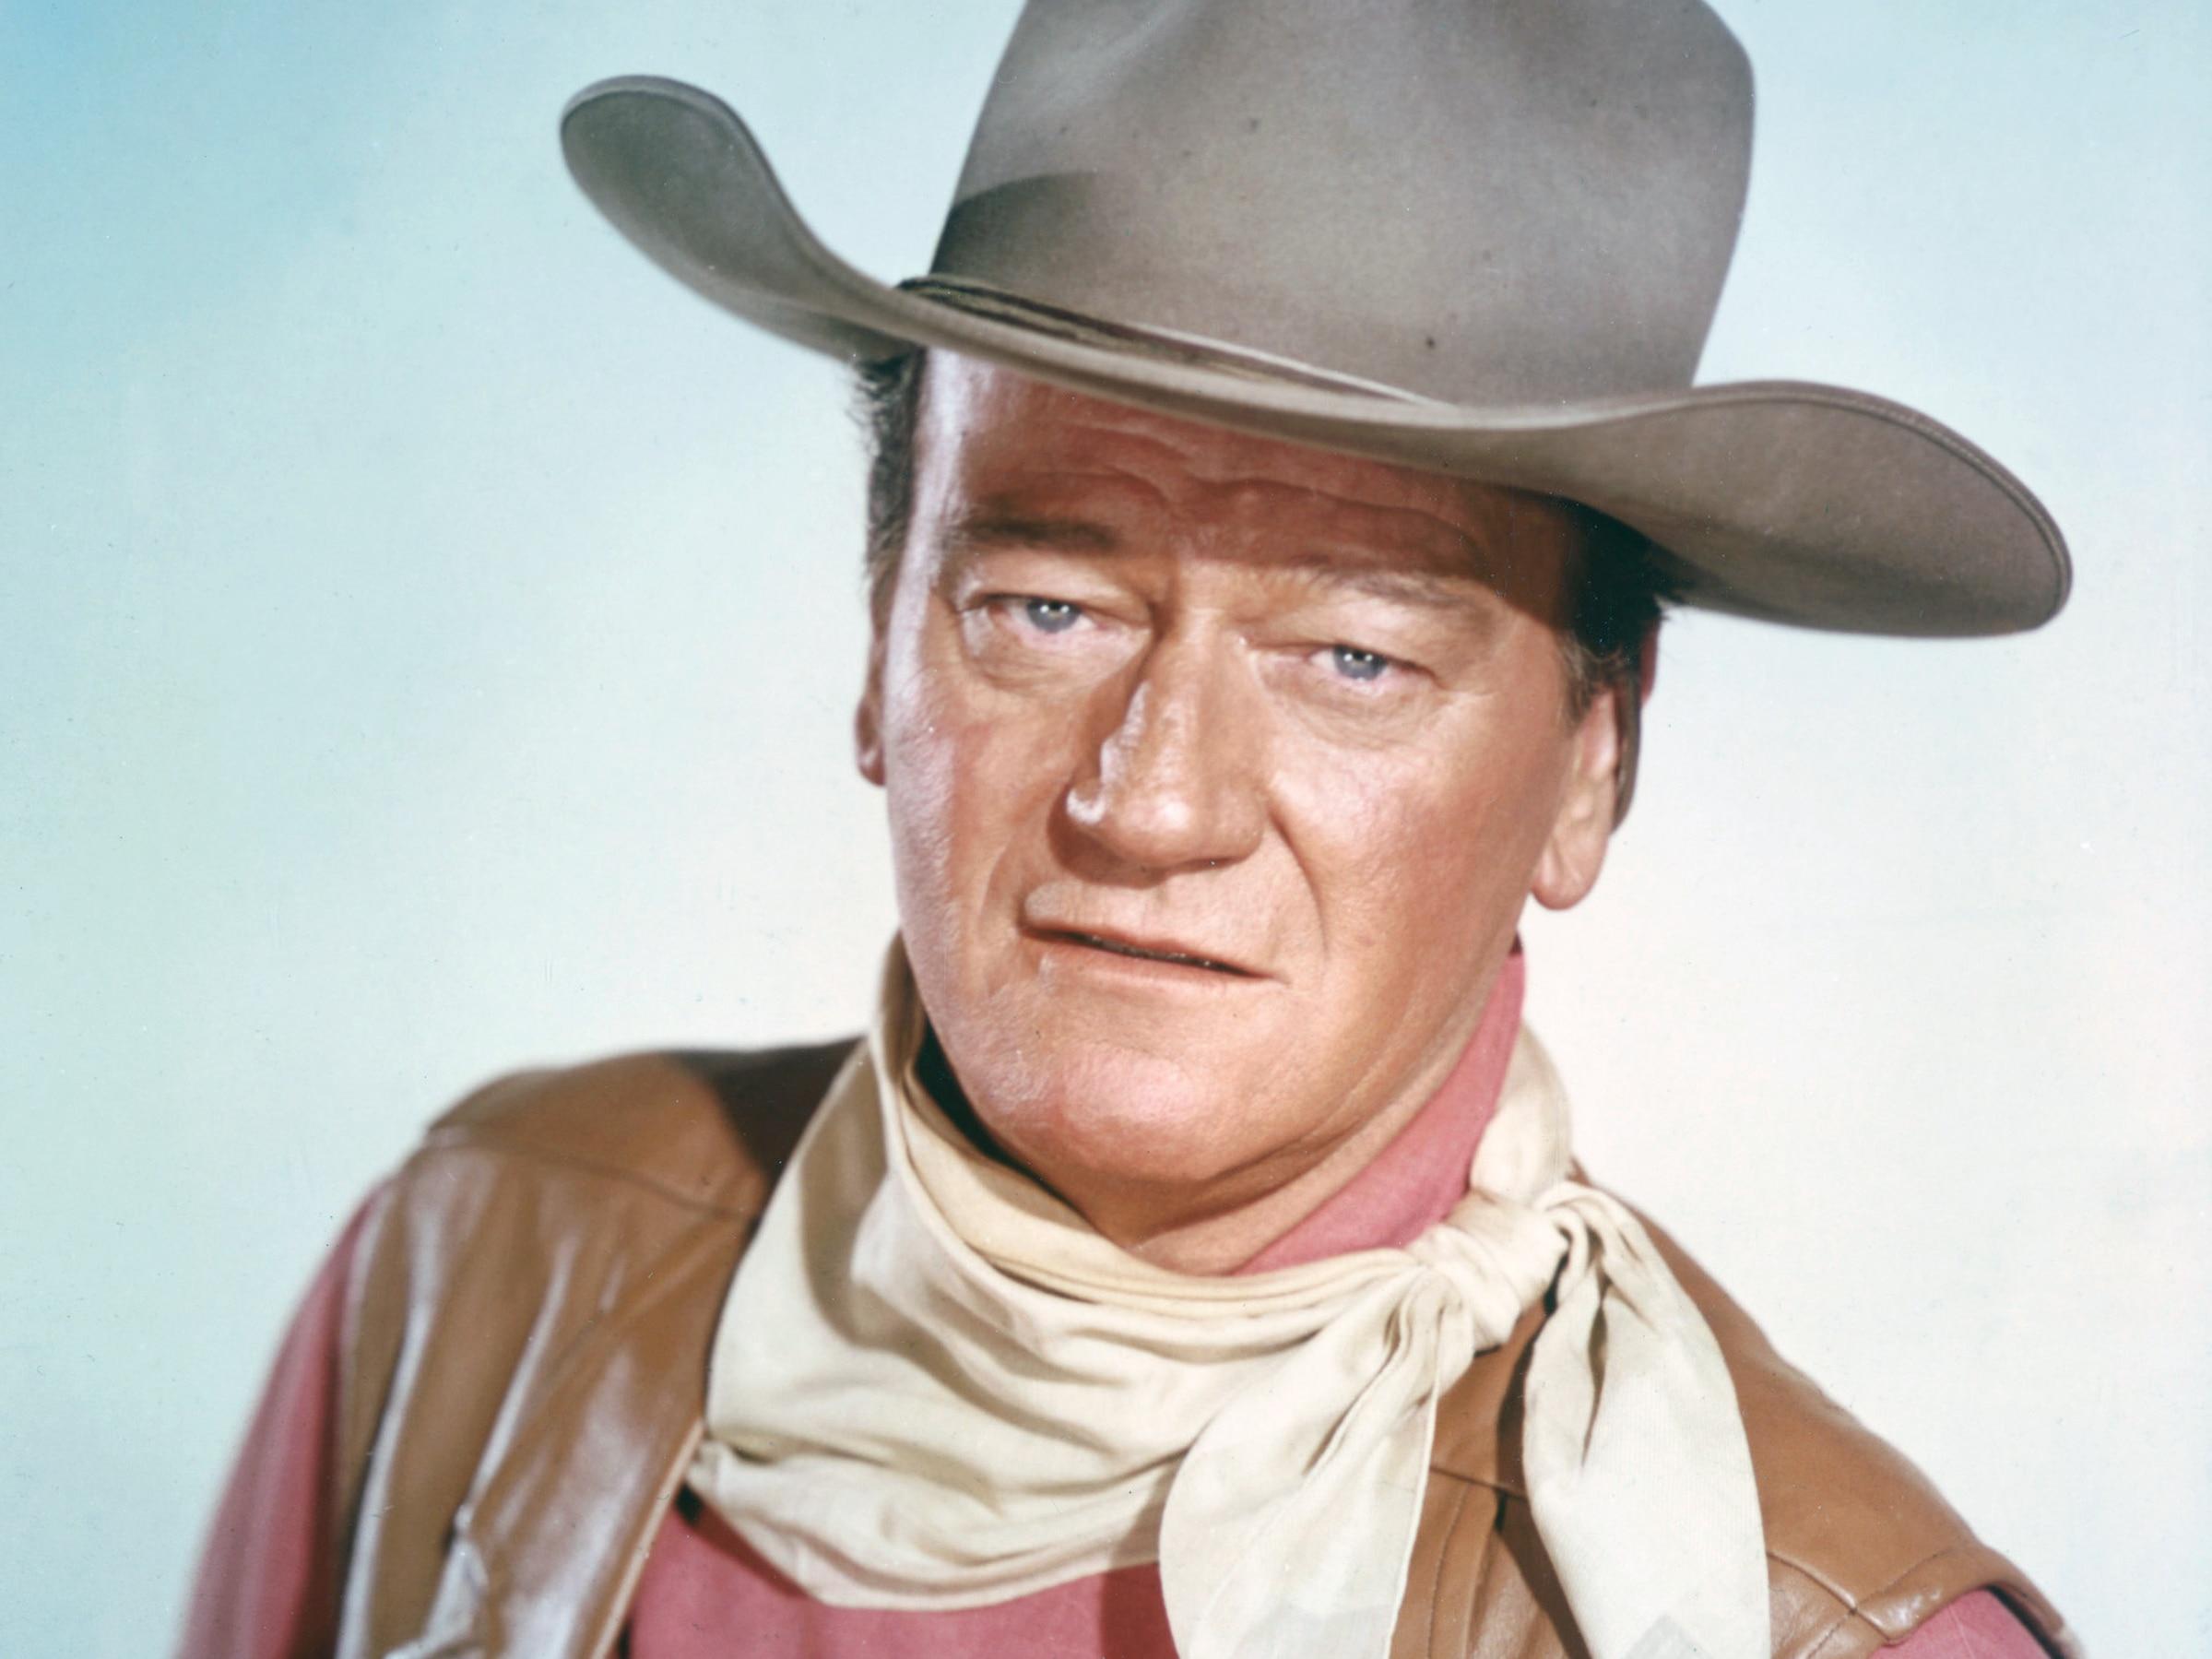 john-wayne-cowboy-1970